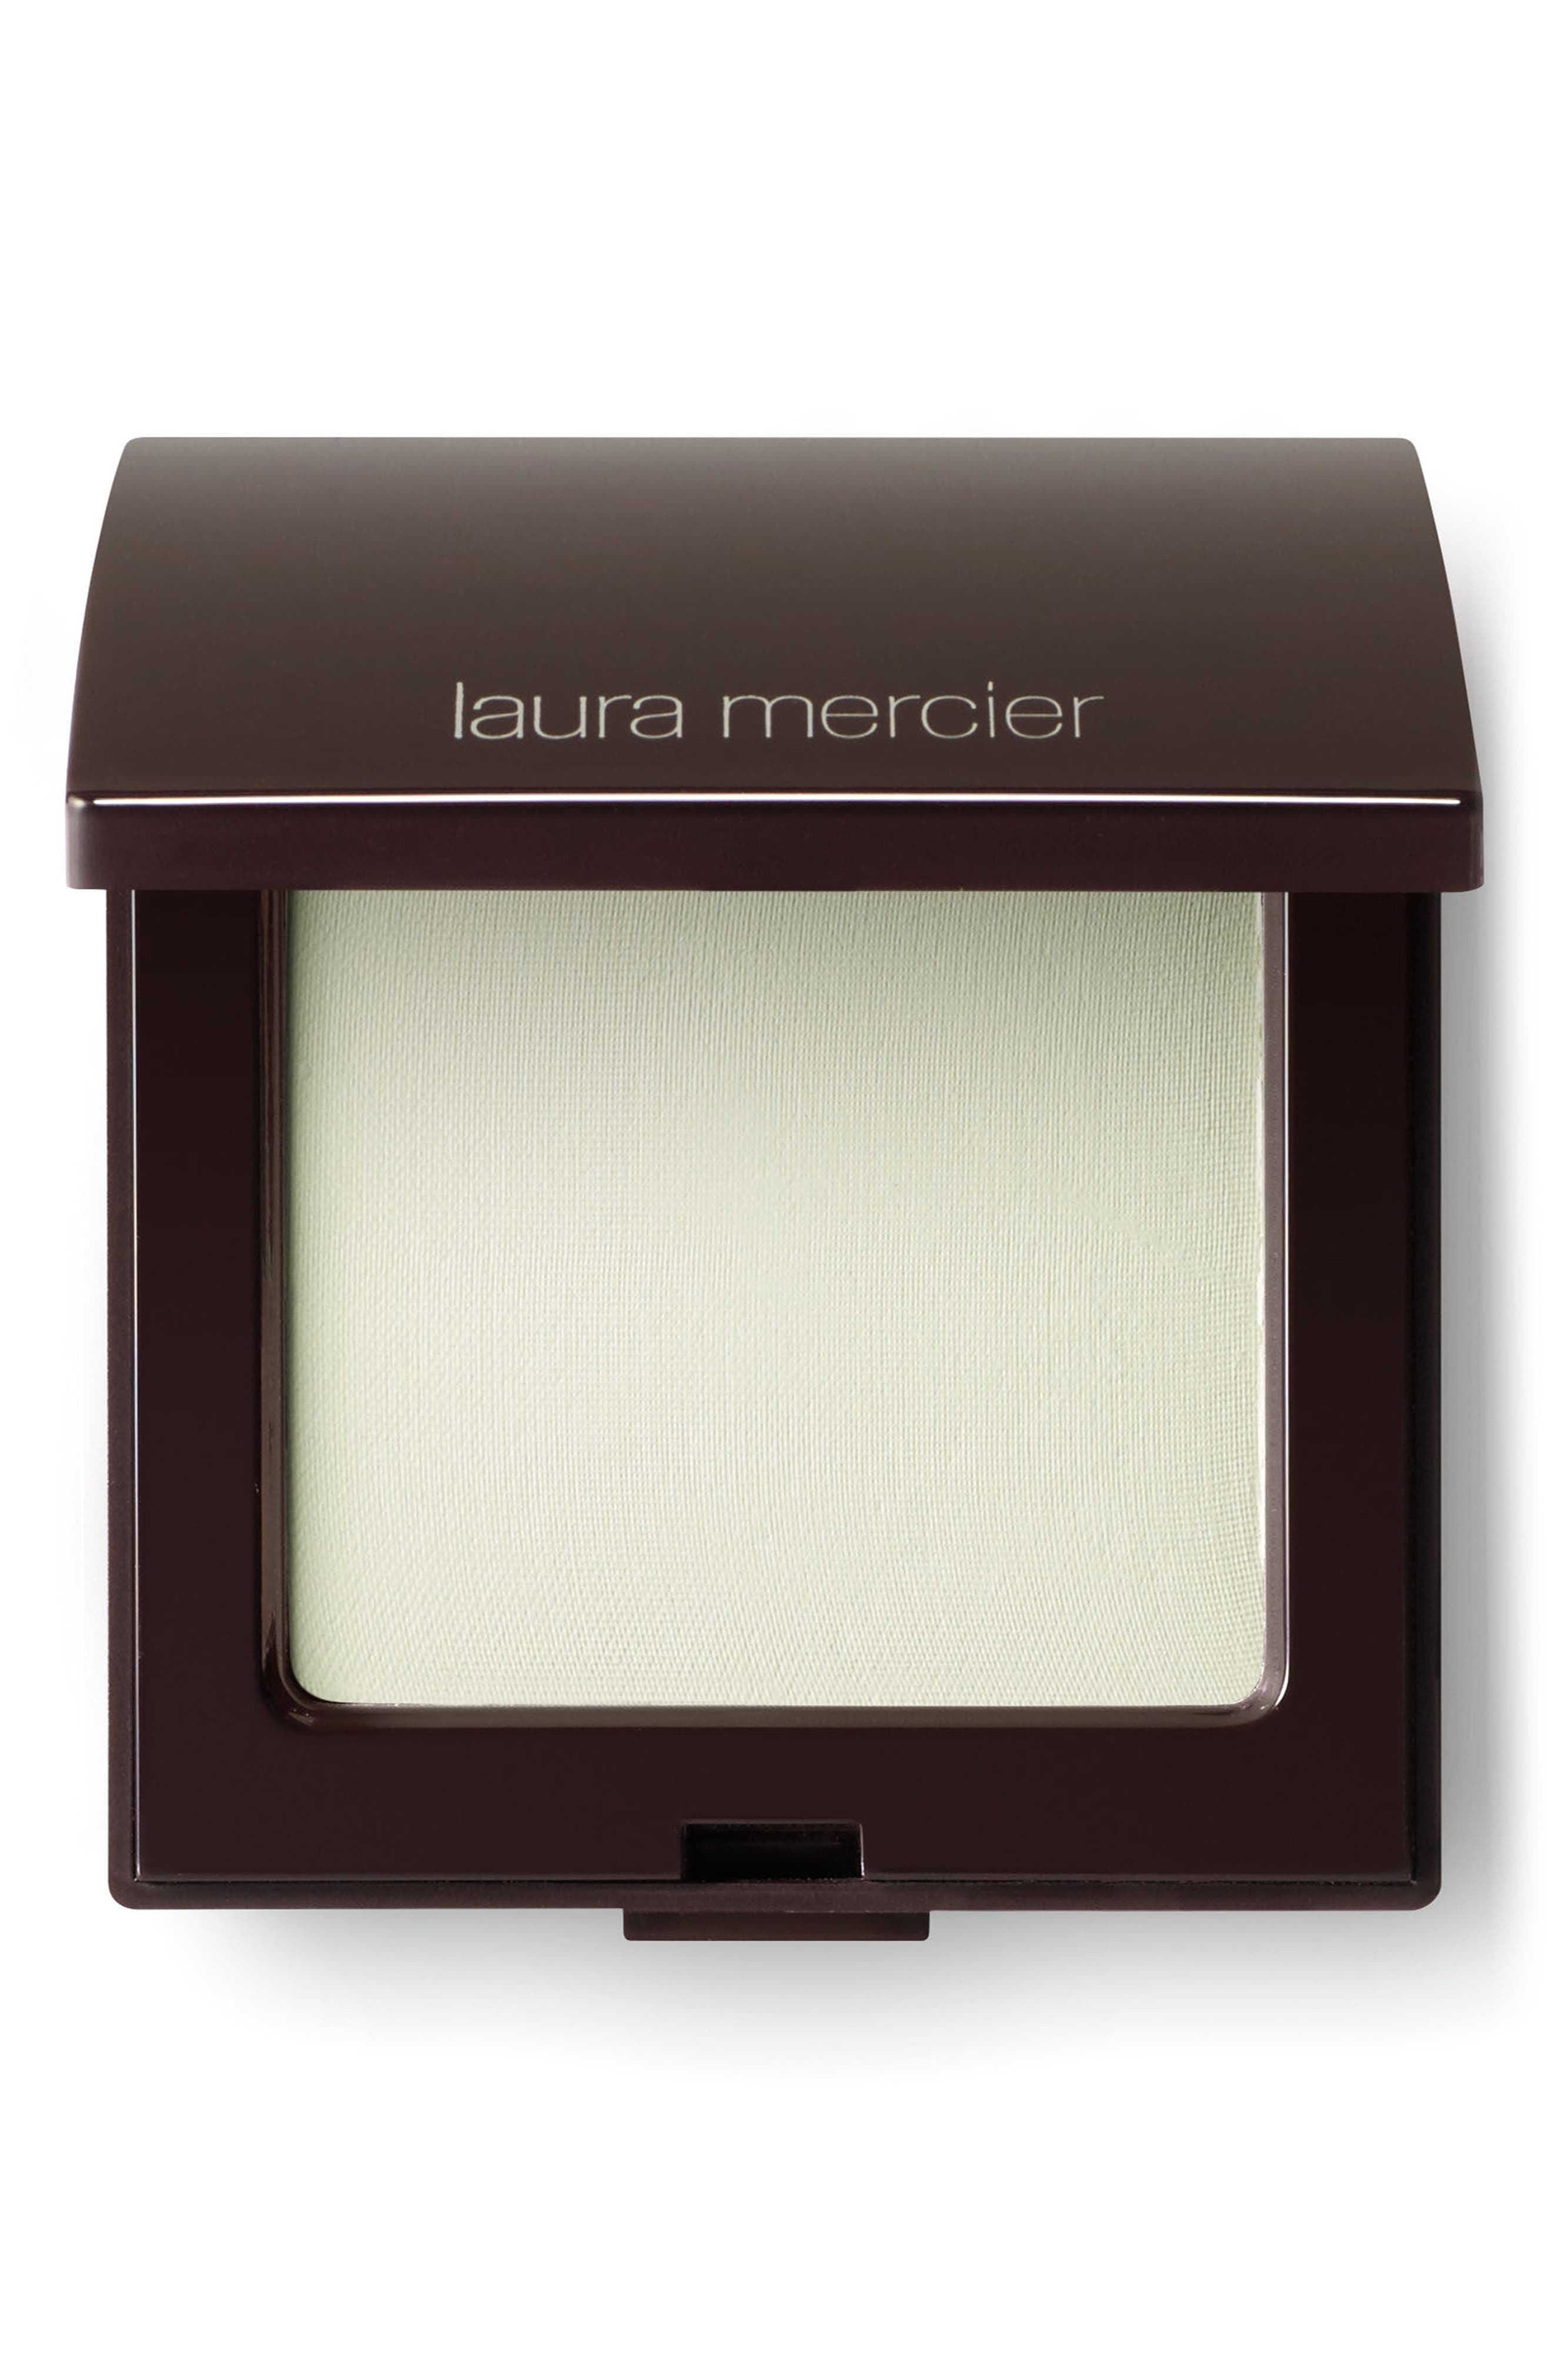 Main Image - Laura Mercier 'Smooth Focus' Pressed Setting Powder